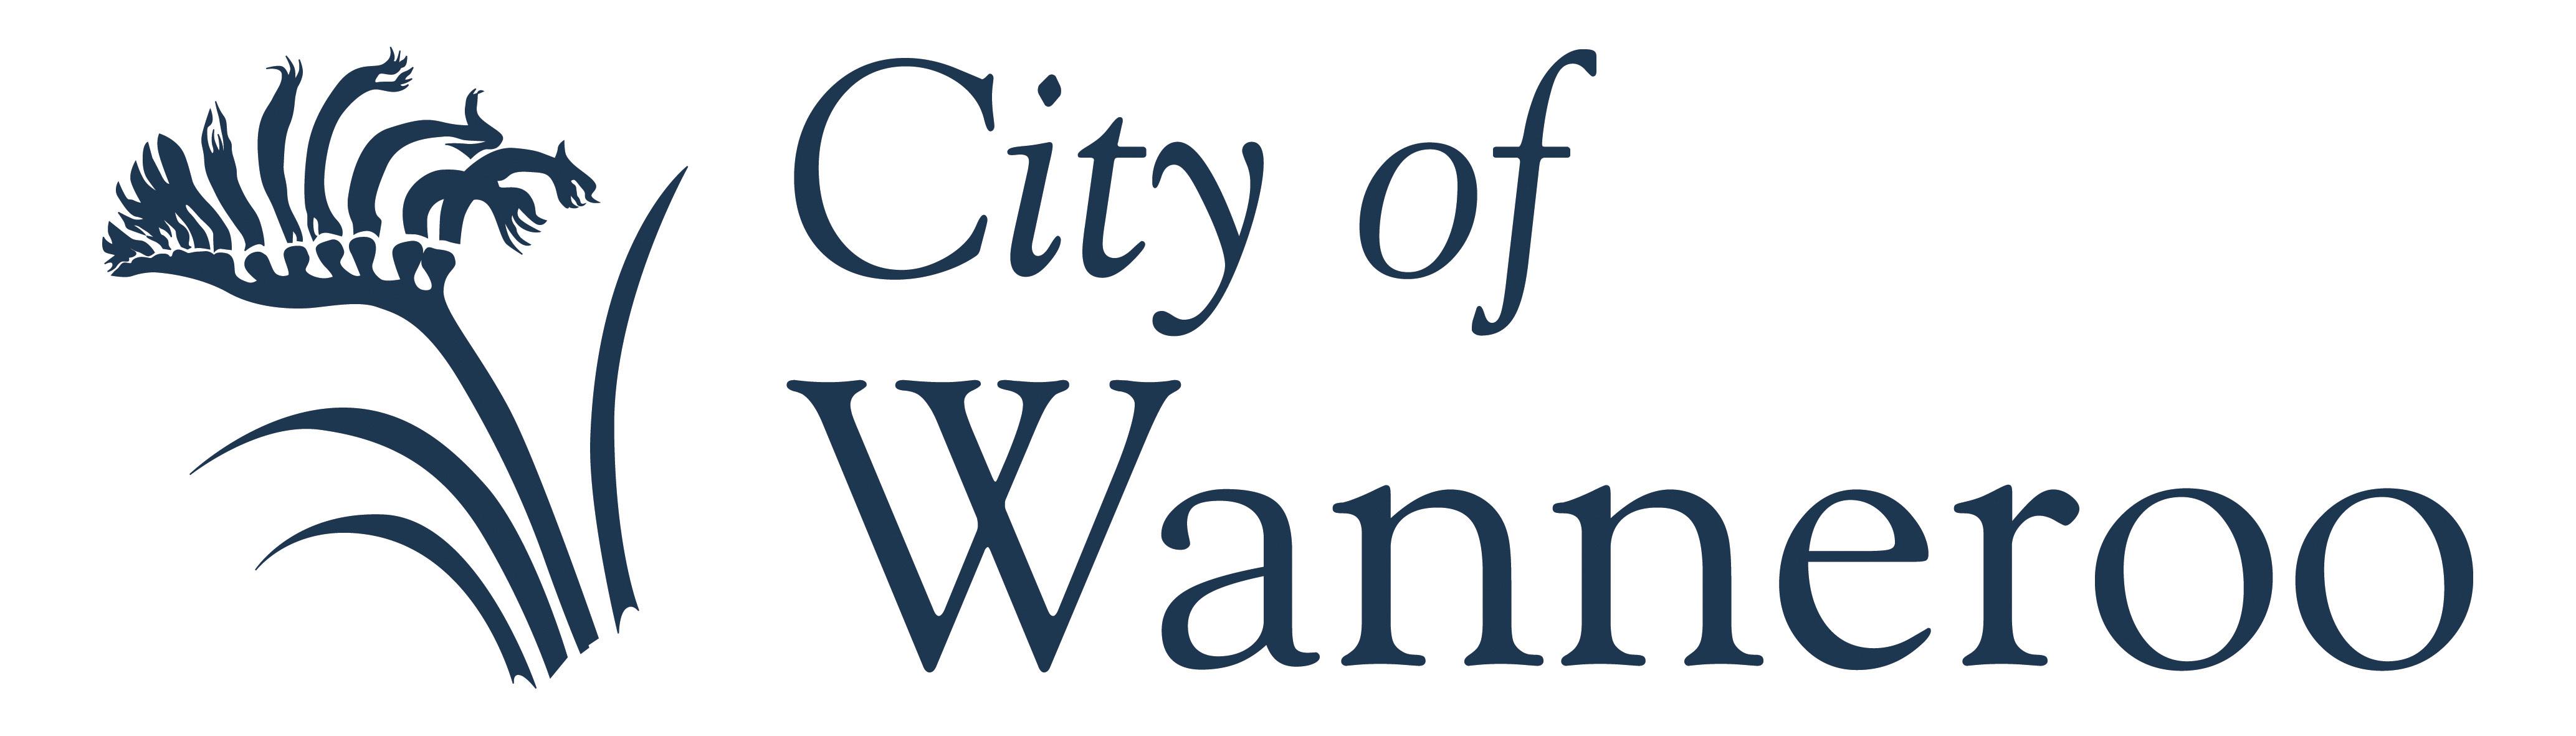 city-of-wanneroo1